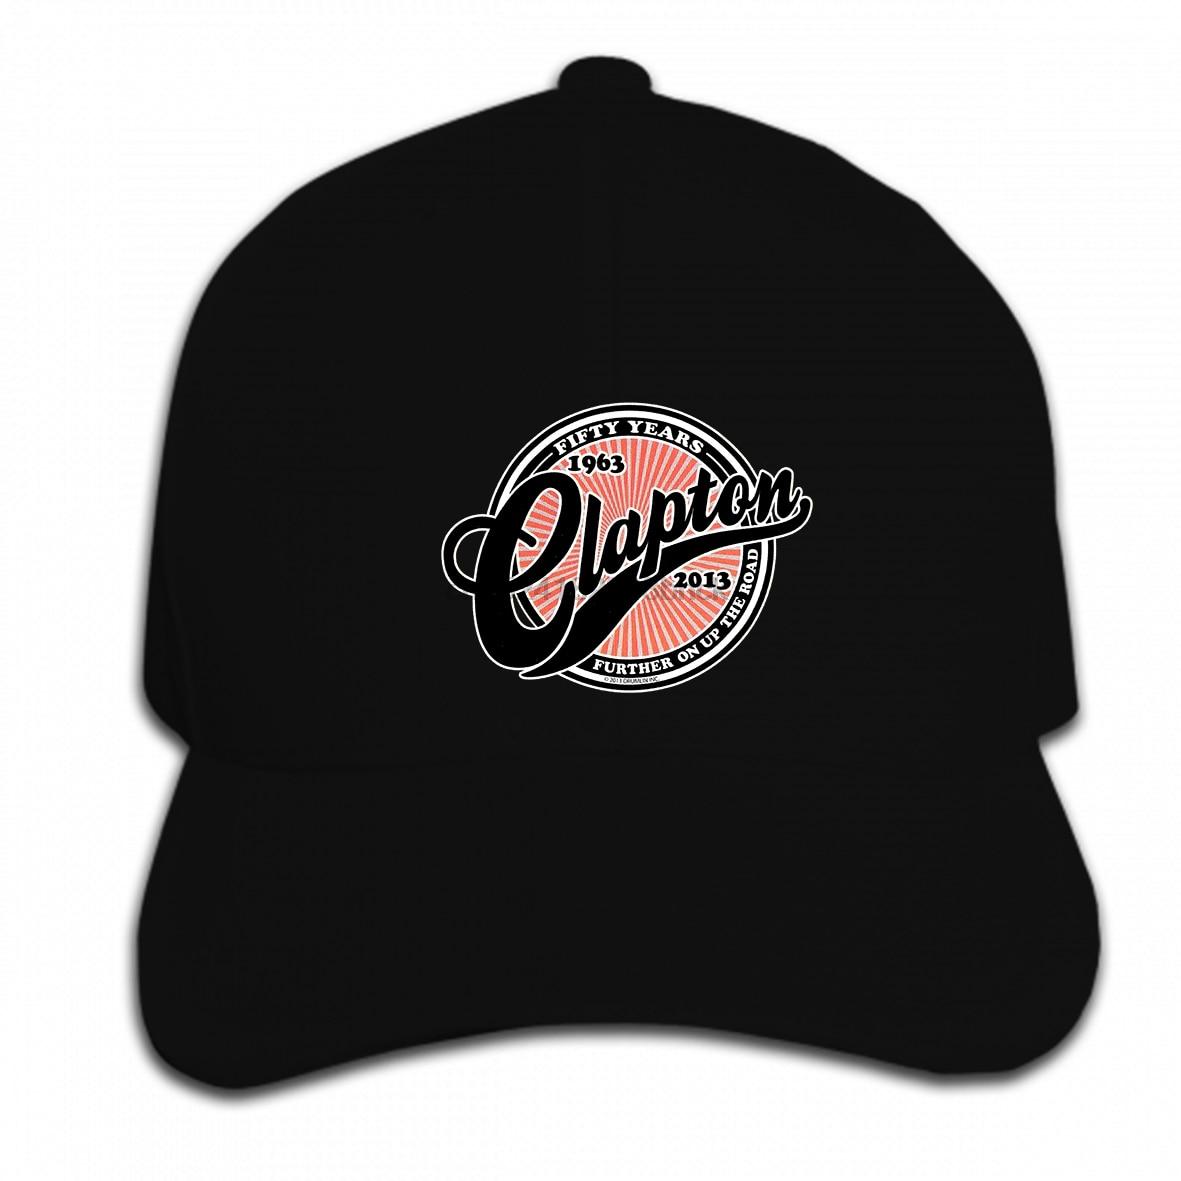 Gorra de béisbol personalizada impresa Hip Hop nuevo Eric Clapton Rock azules guitarrista cincuenta años hombres 3D hombres sombrero gorra pico